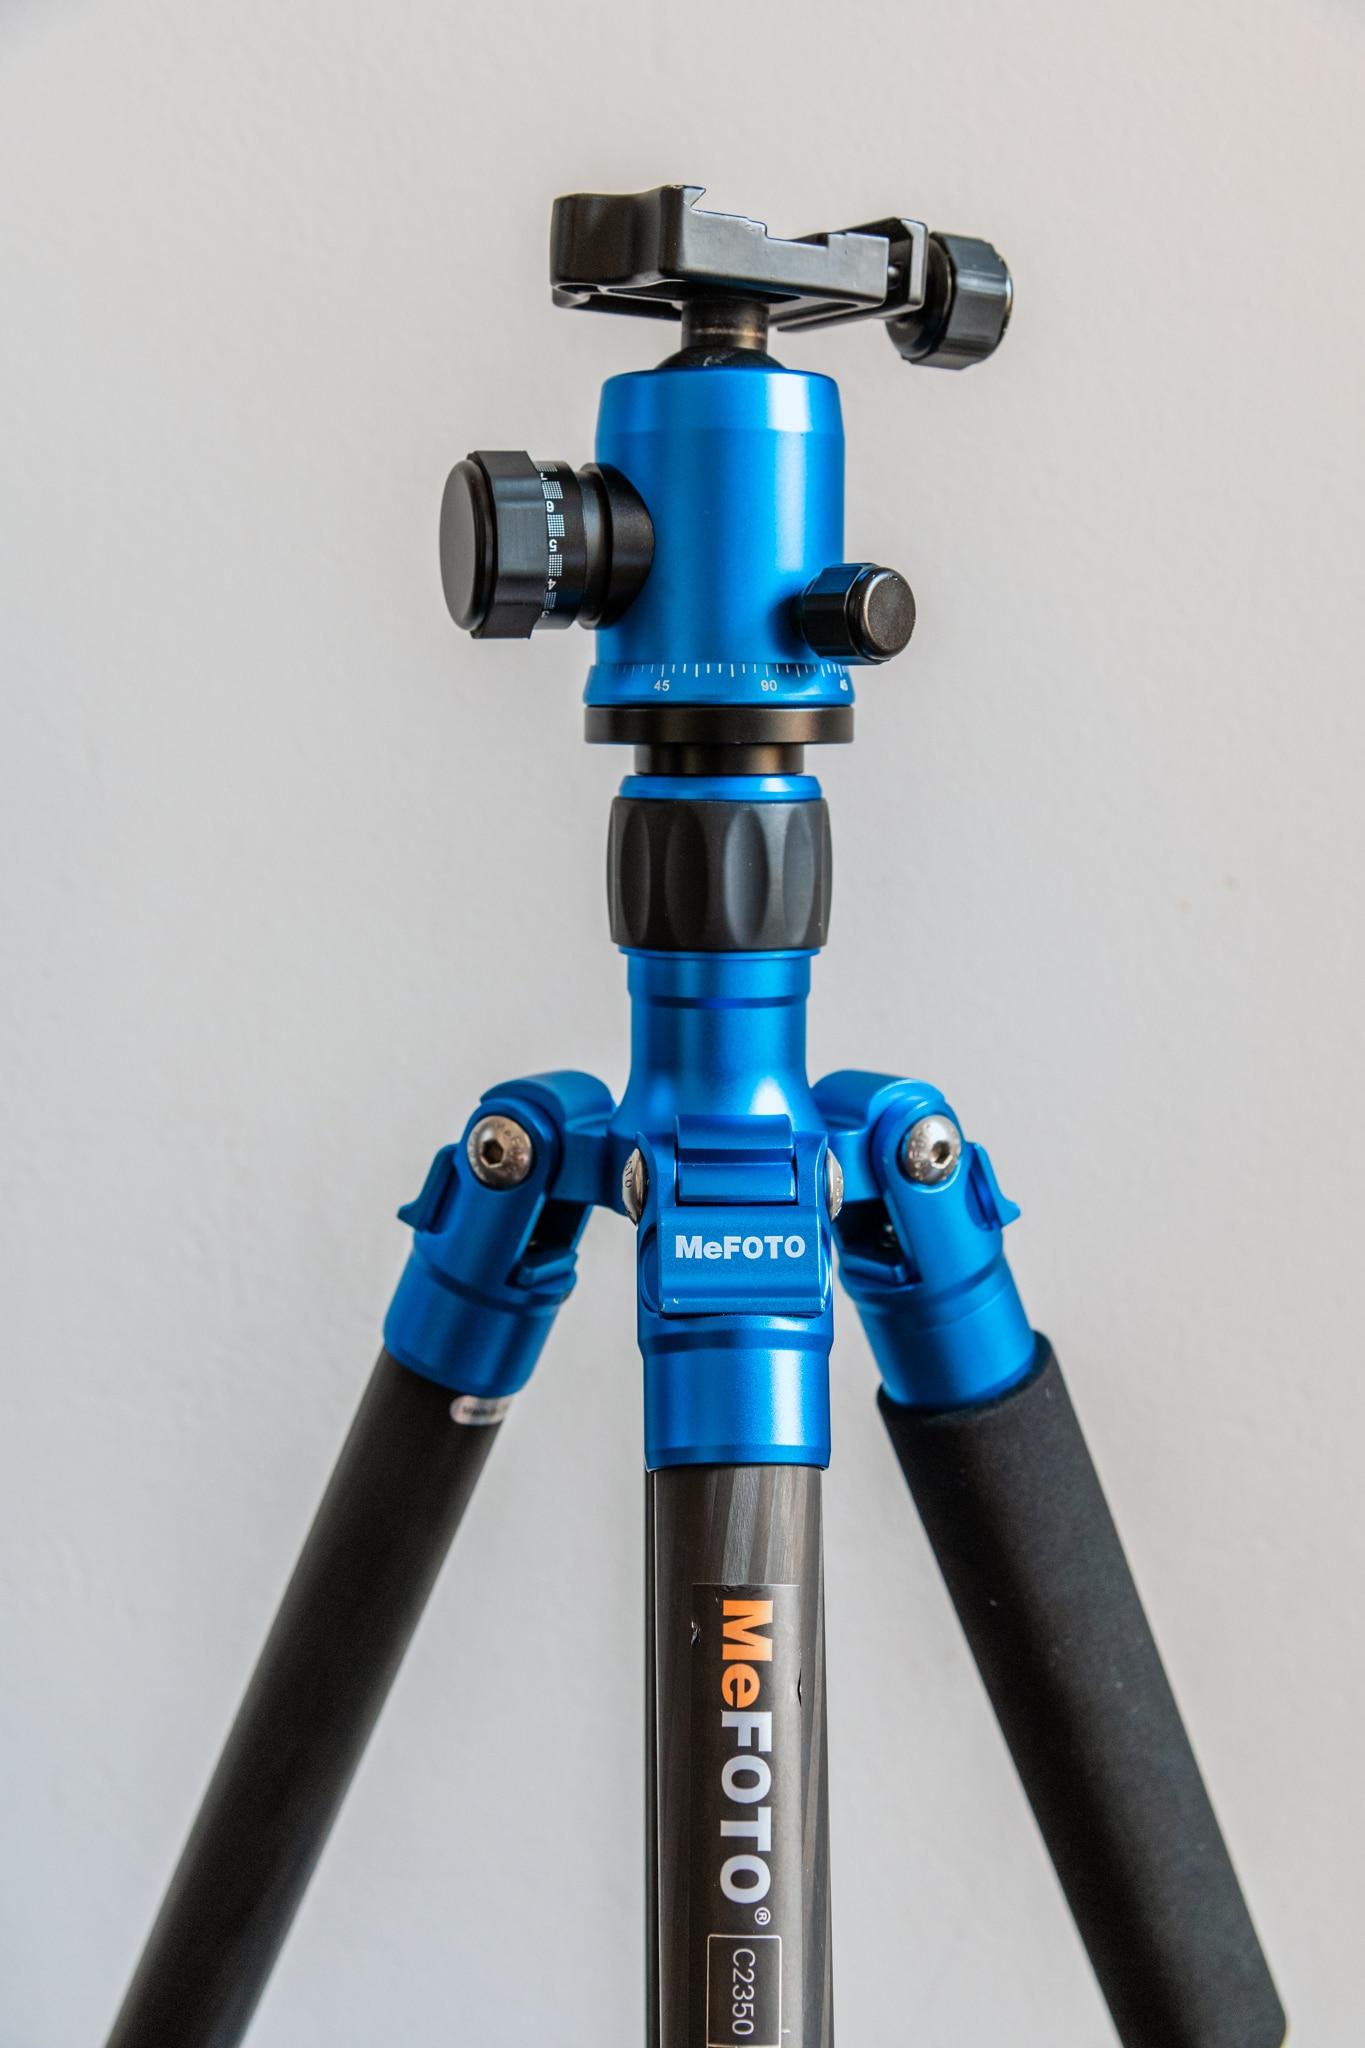 MeFoto GlobeTrotter carbon fiber travel tripod